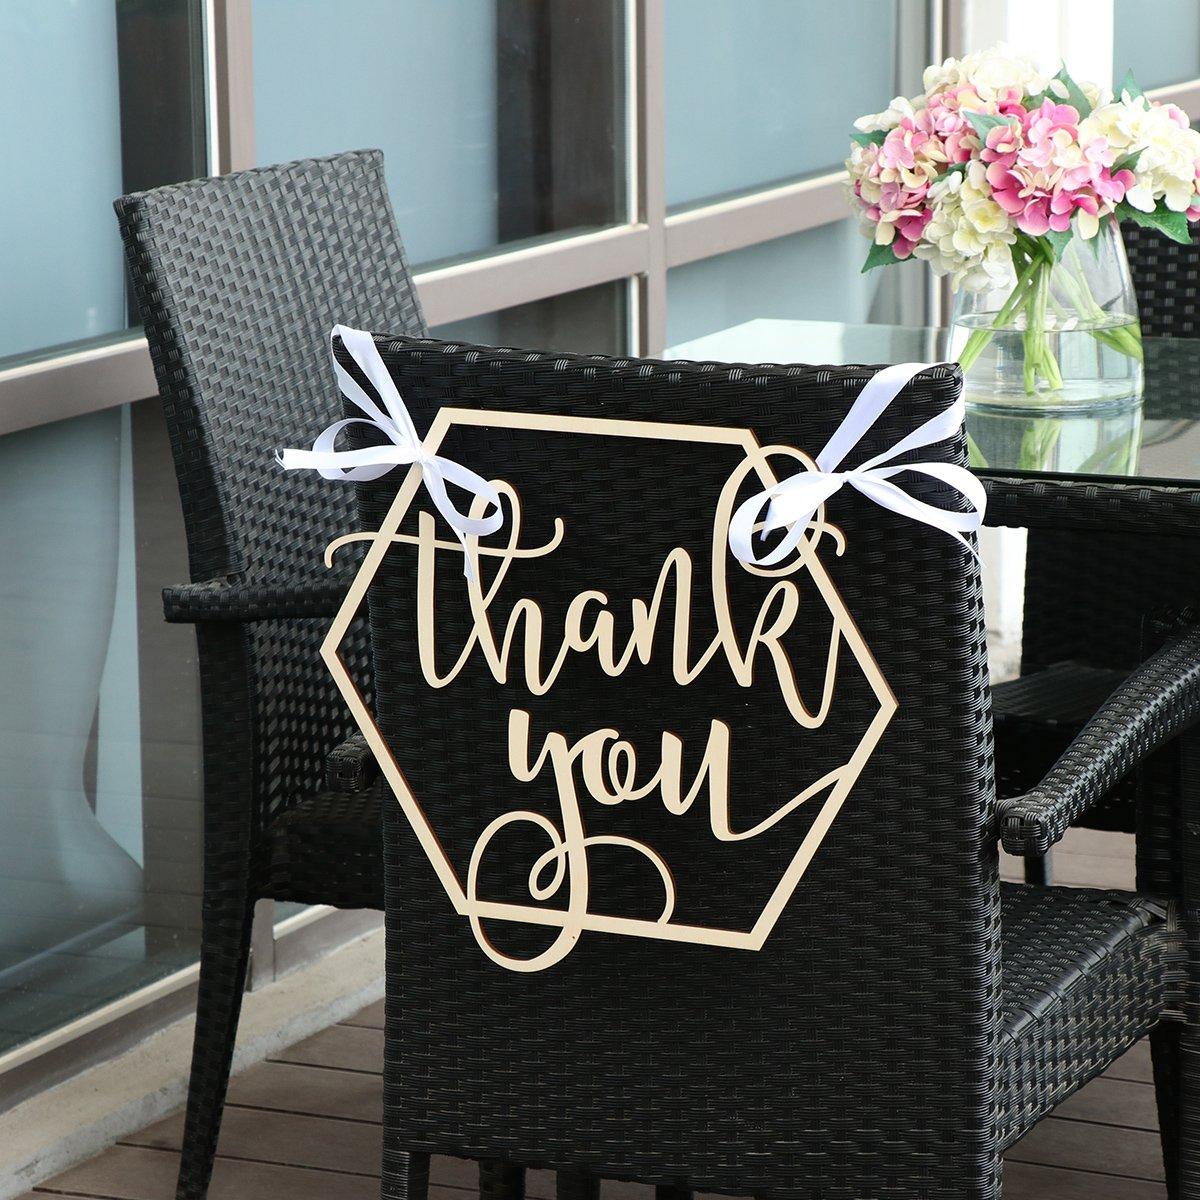 BESTOYARD Wedding Chair Banner Thank You Wood Sign Wedding Photo Booth Prop Wedding Party Decoration by BESTOYARD (Image #4)